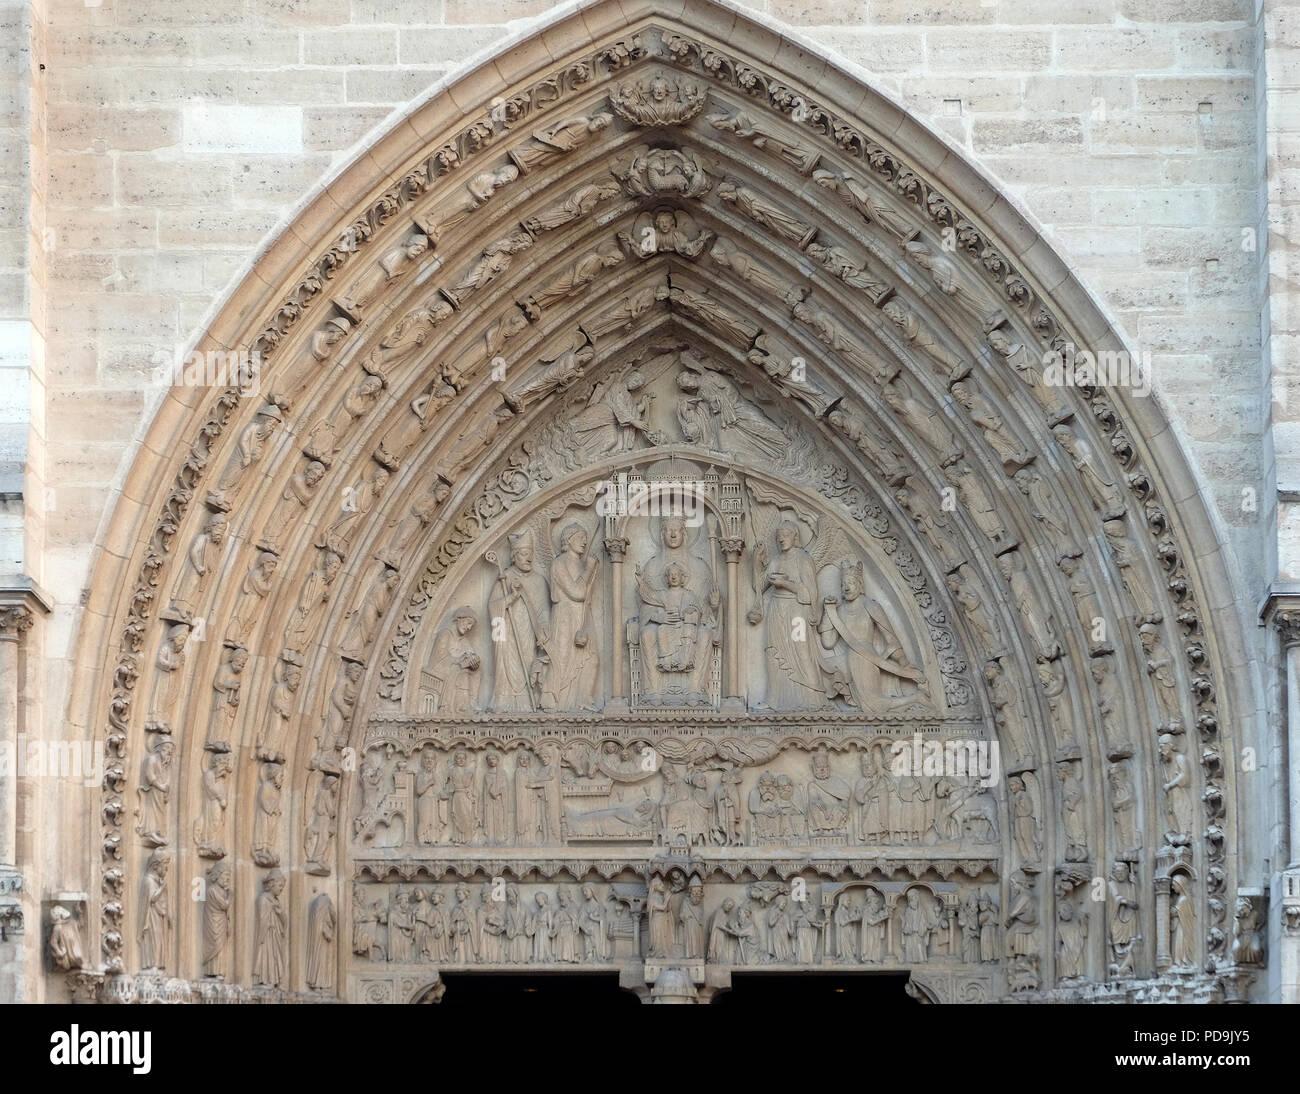 Portal of St. Anne, Notre Dame Cathedral, Paris, UNESCO World Heritage Site in Paris, France Stock Photo